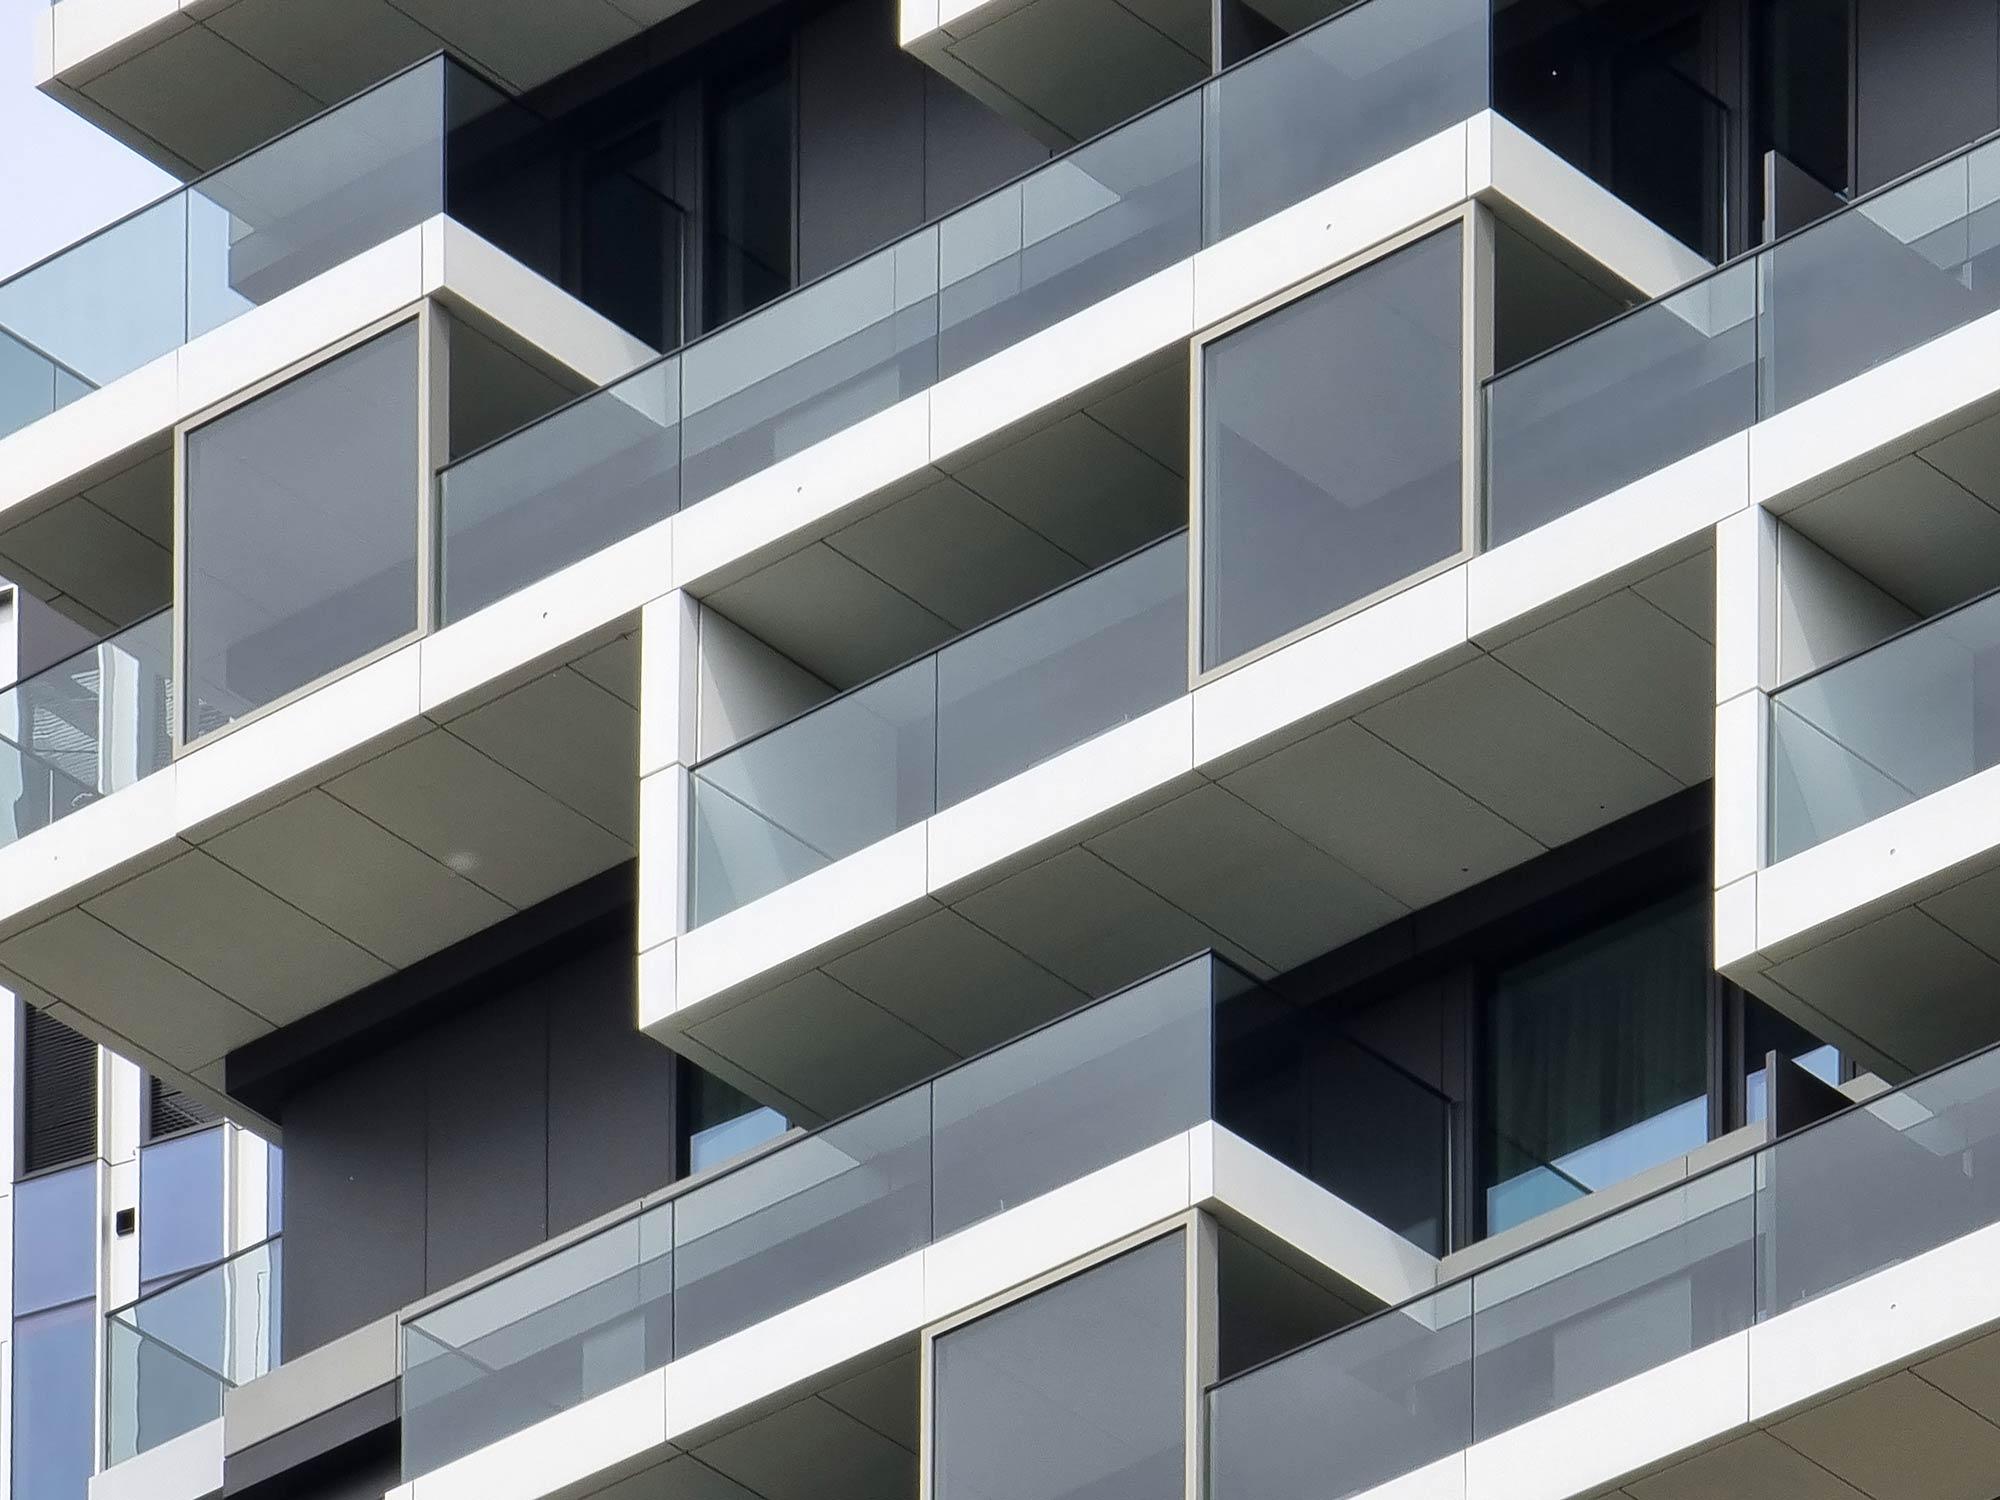 140 West FFM - Balkone und Fassade - One Forty West - Mai 2021